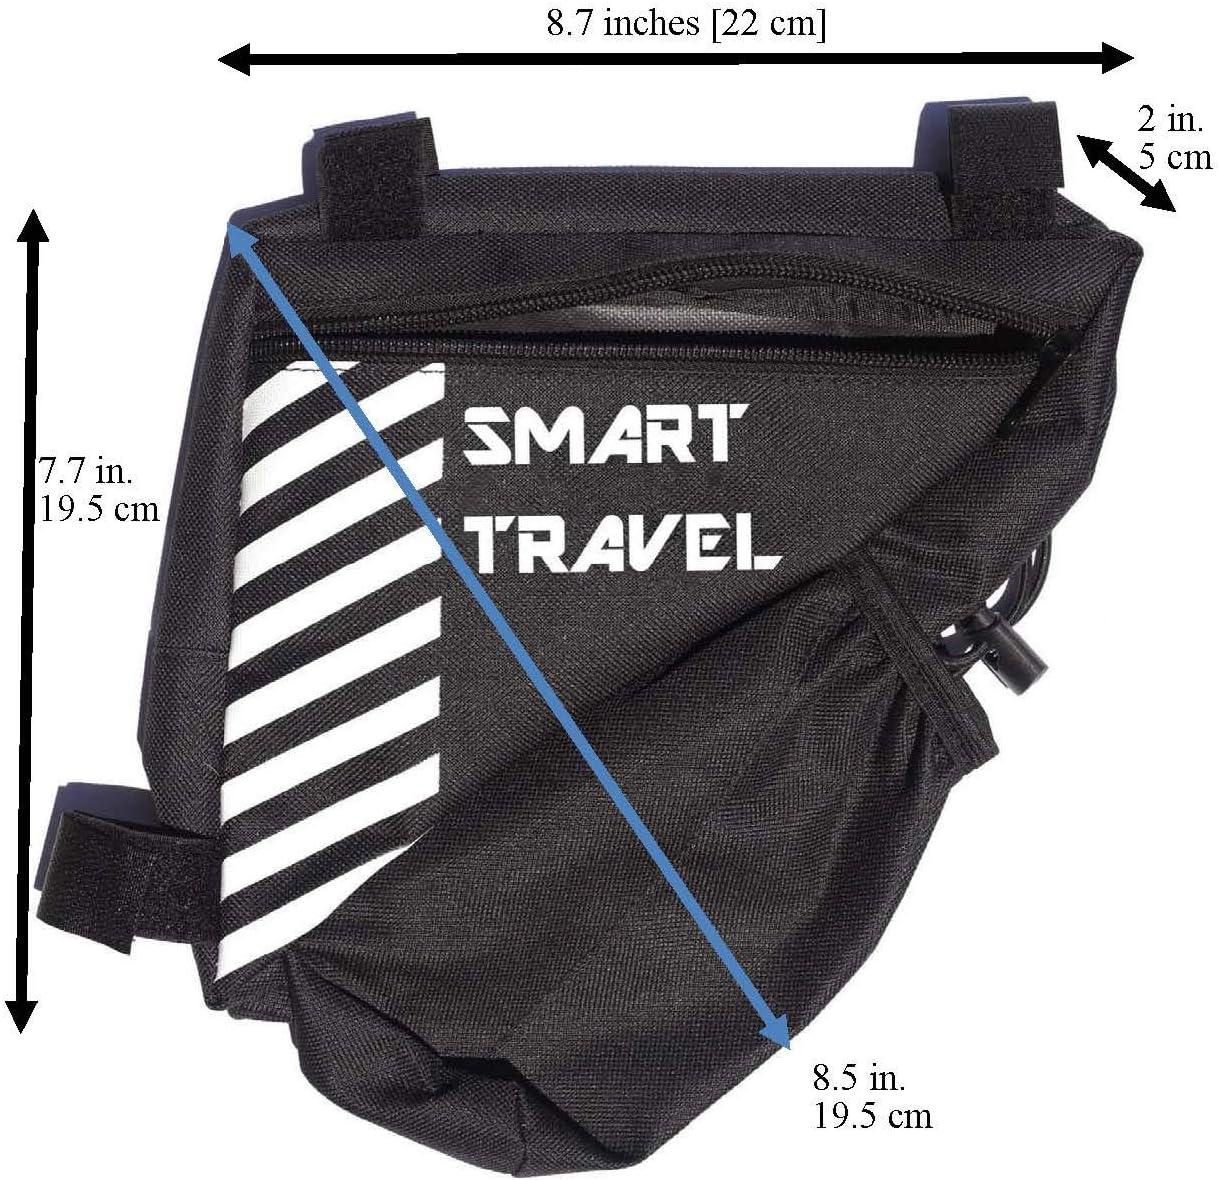 Smart Travel Bicycle Storage Bag Black Bike Water Bottle Holder Phone Holder for Bike Bike Accessories